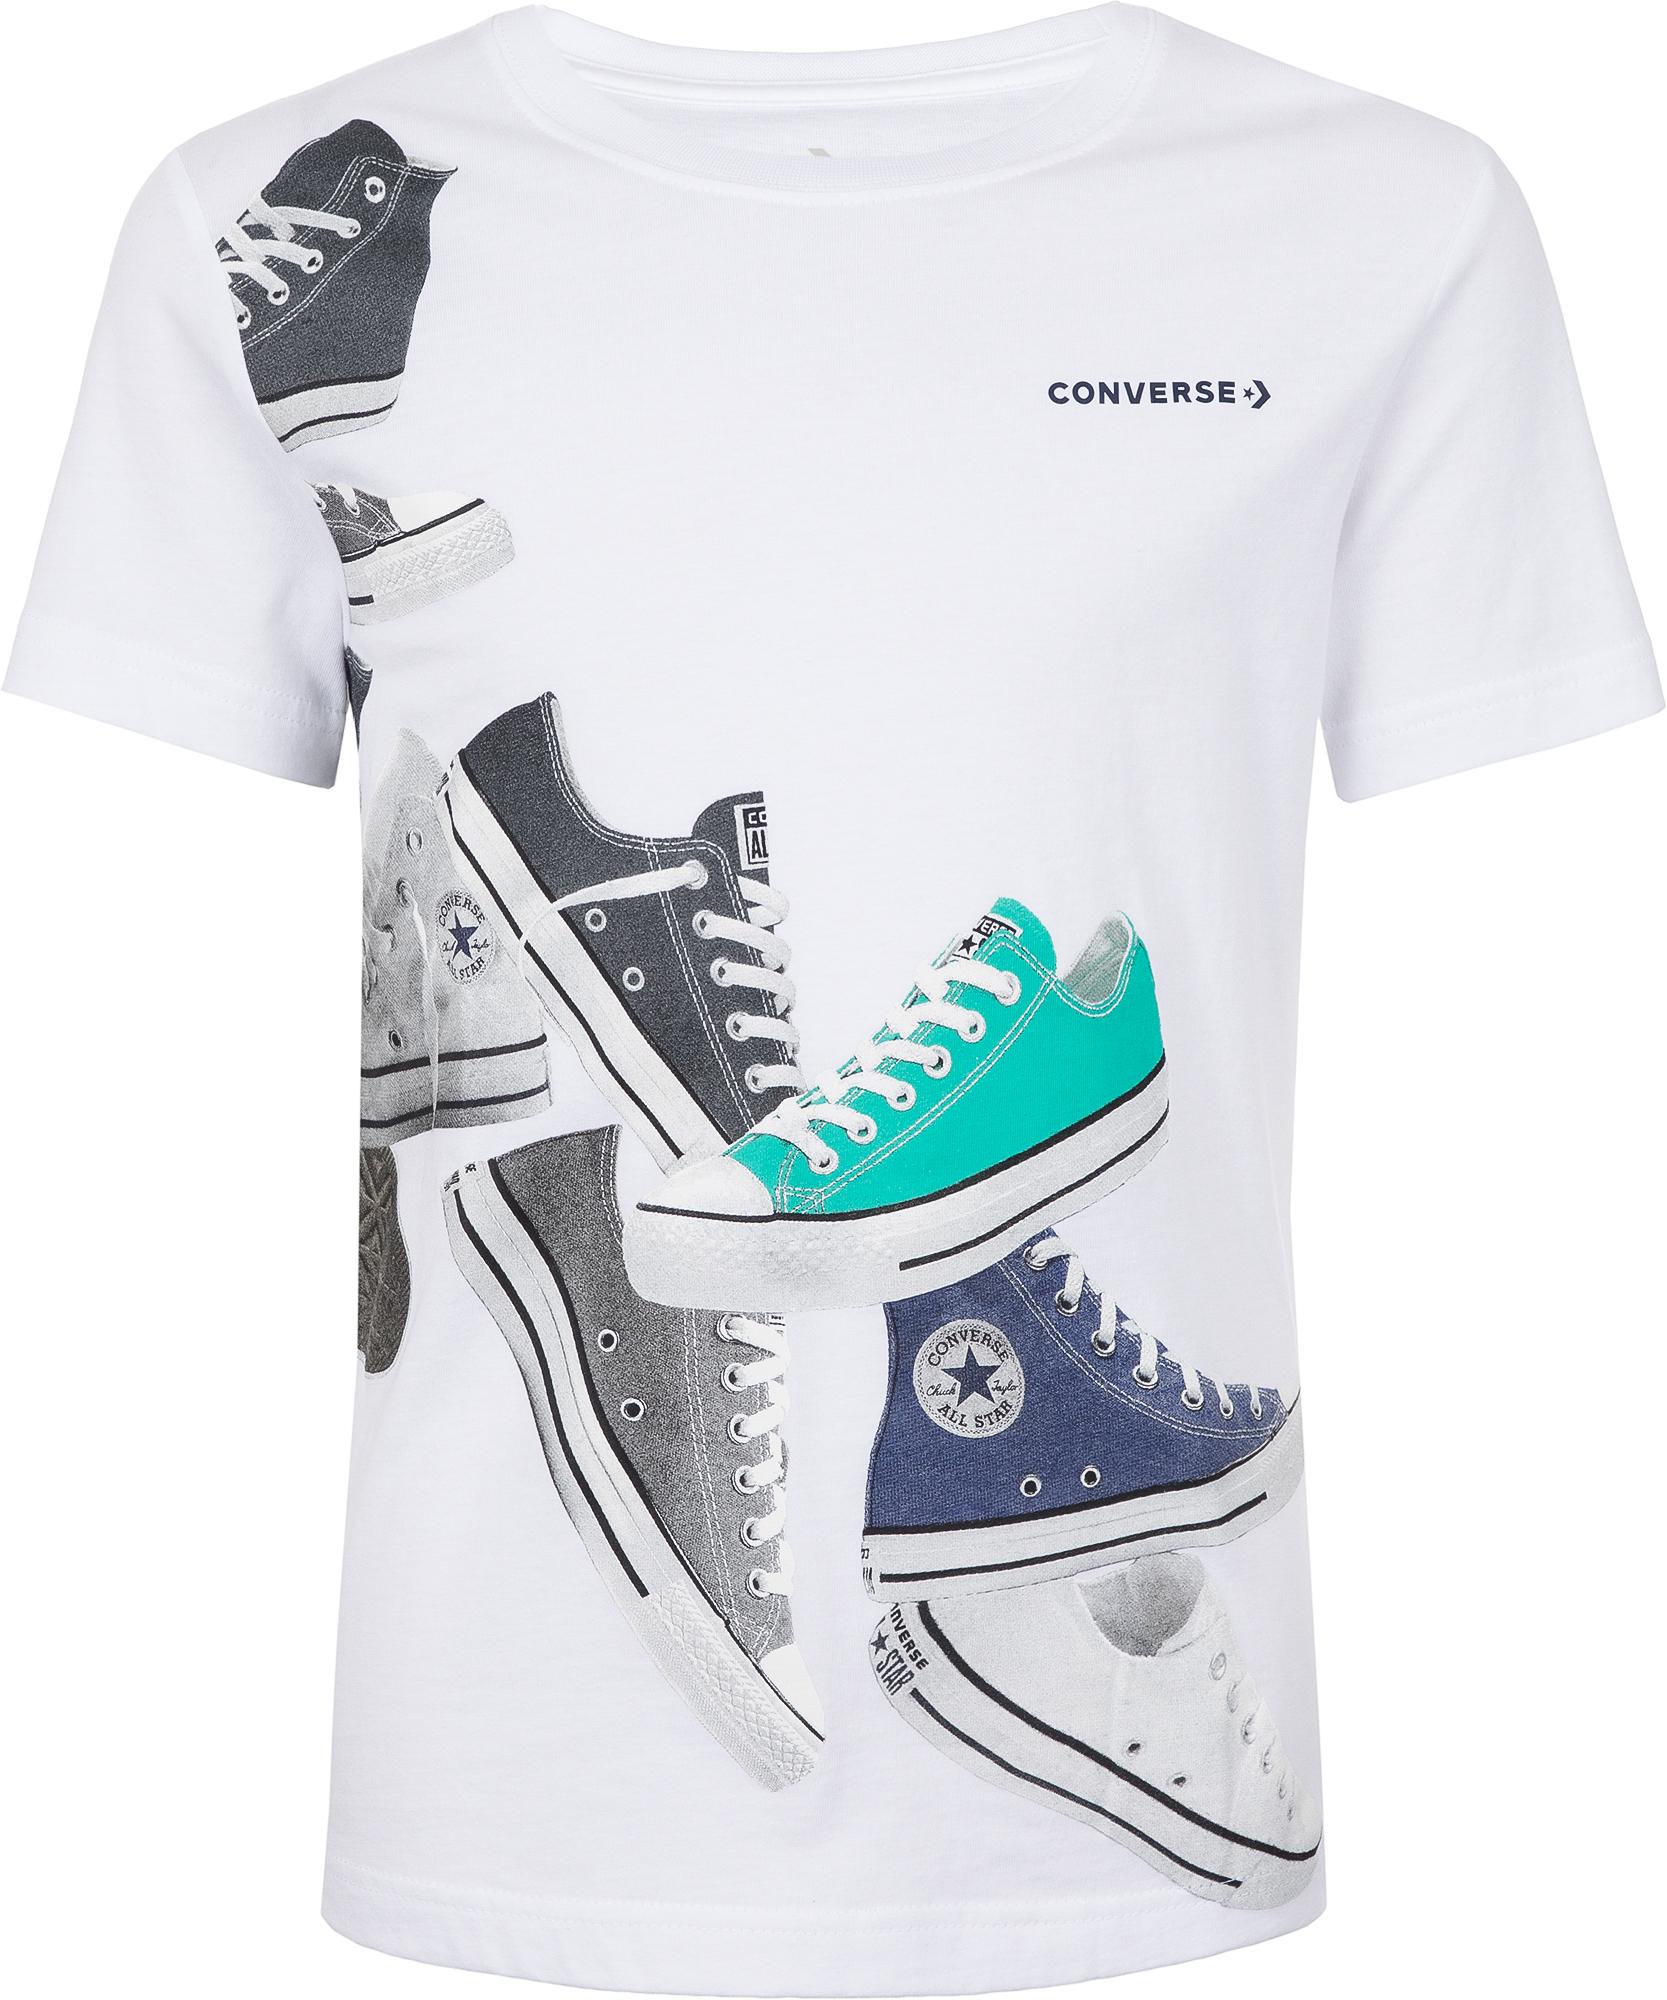 Converse Футболка для мальчиков Chucks Wrap, размер 164